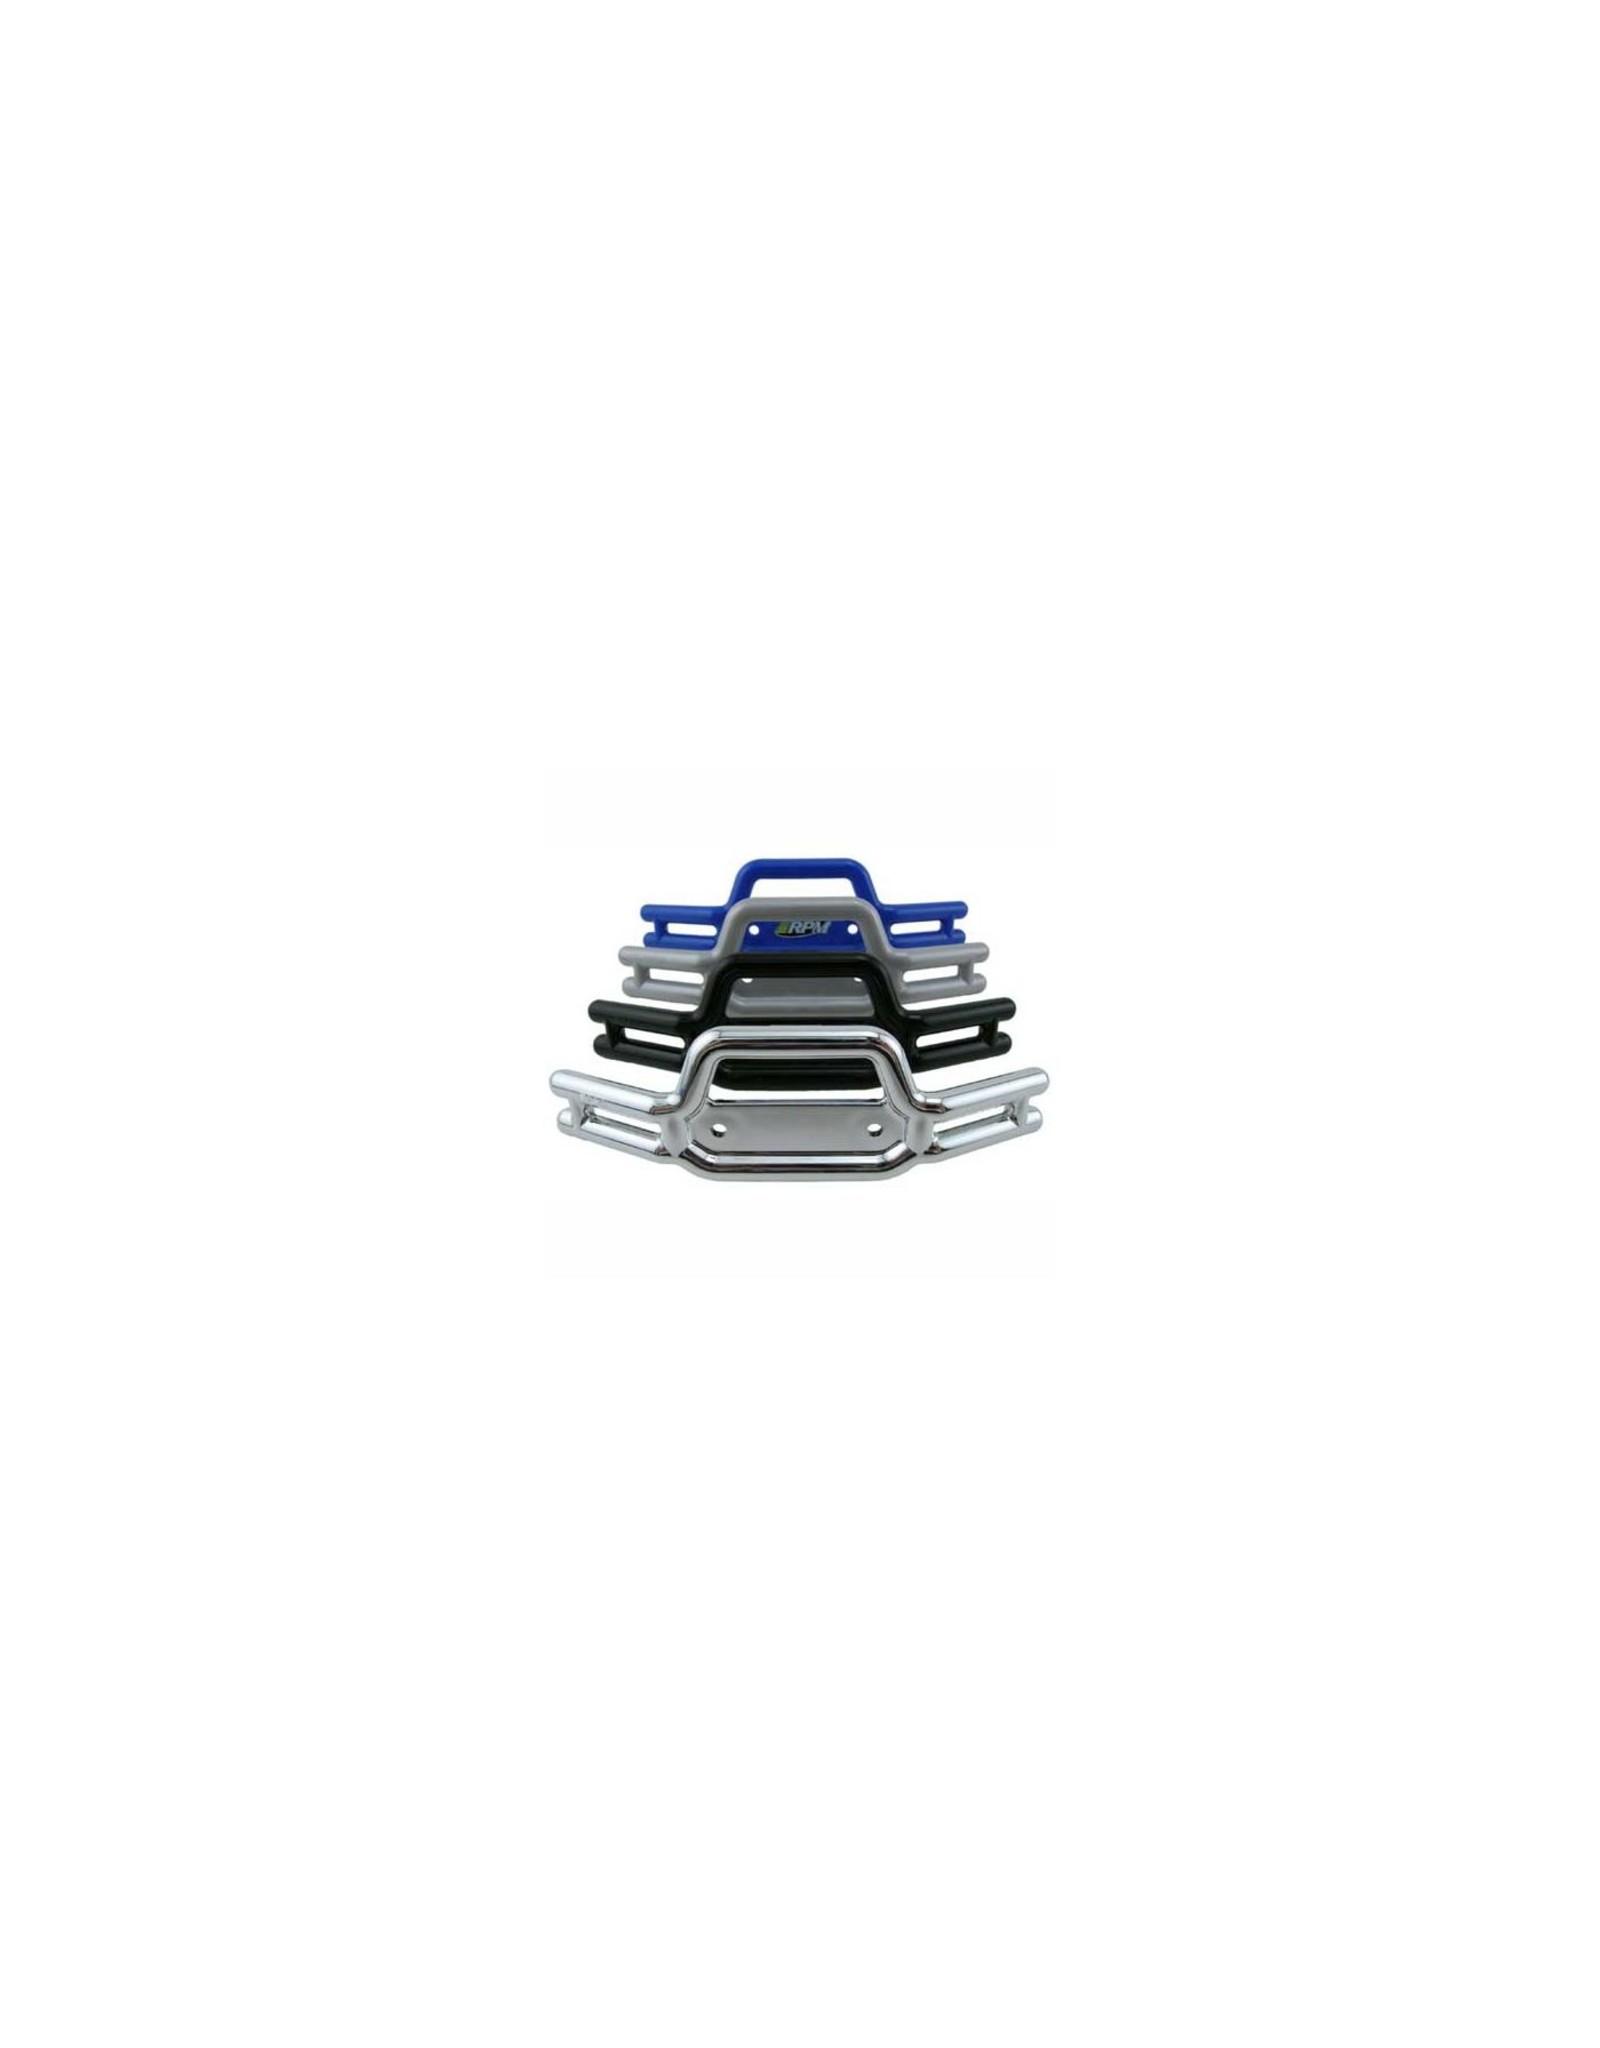 RPM Front Tubular Bumper Black Revo (80452)